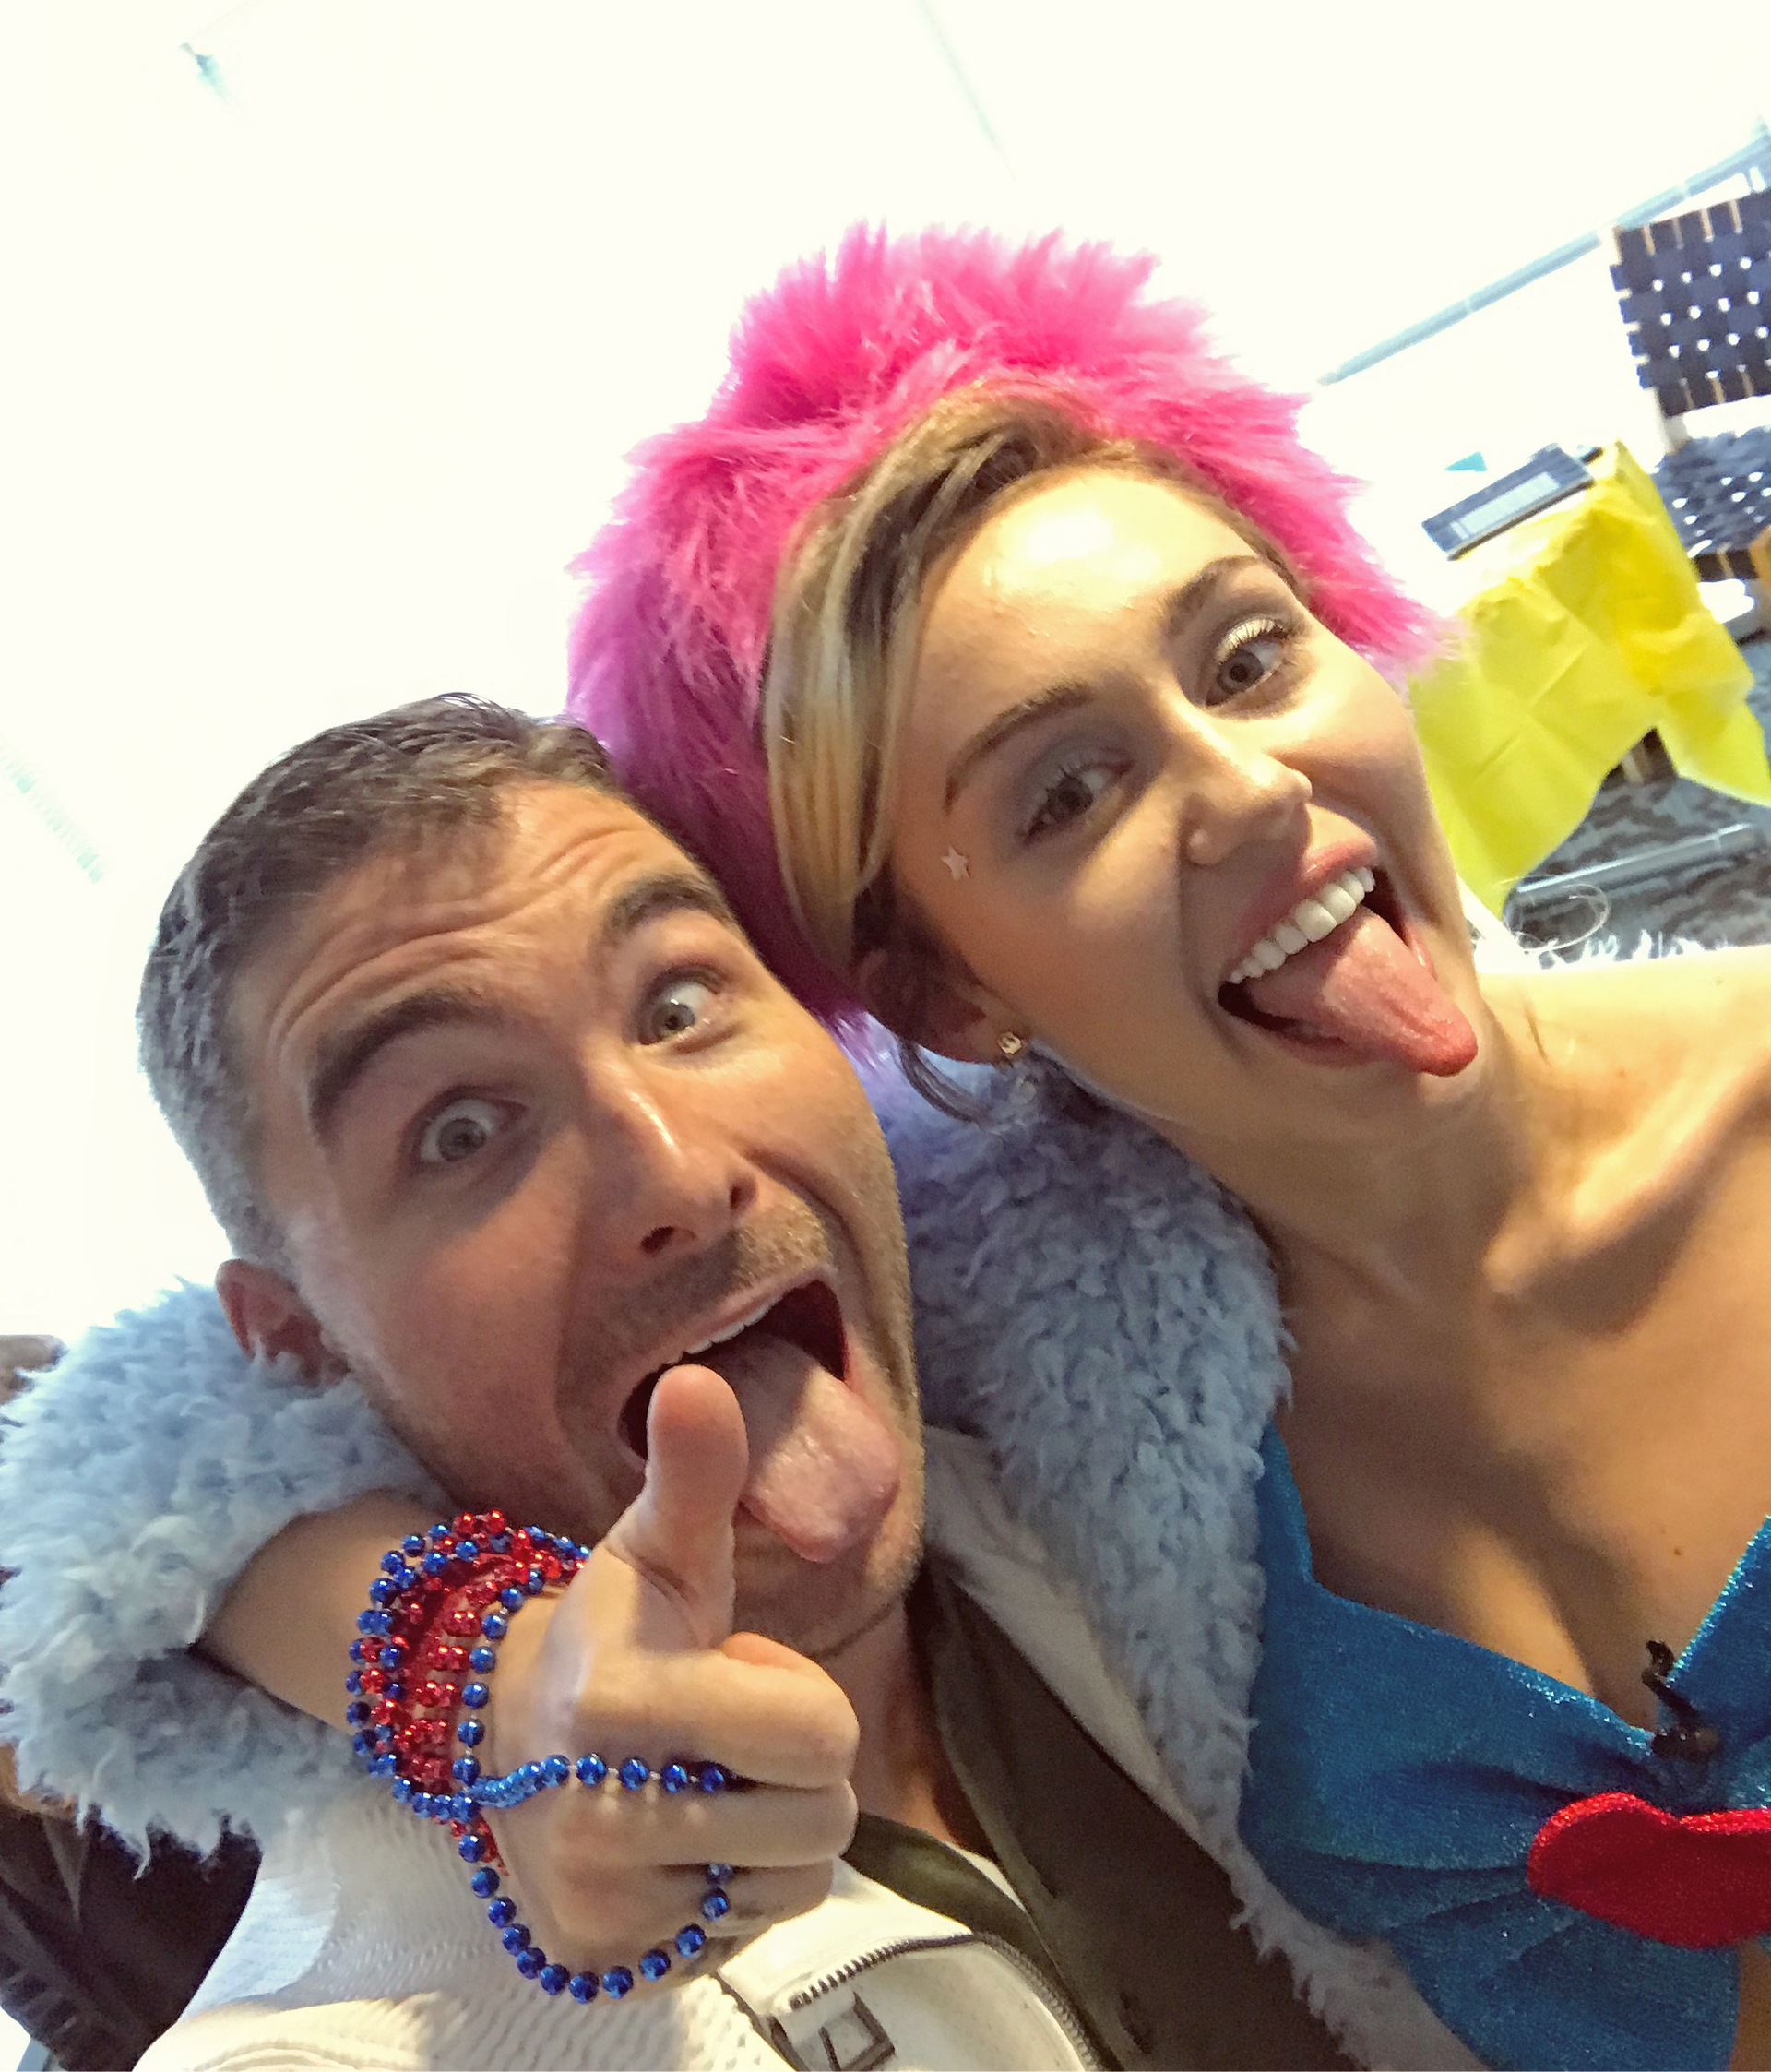 Director-James-Kicklighter-Miley-Cyrus-Selfie